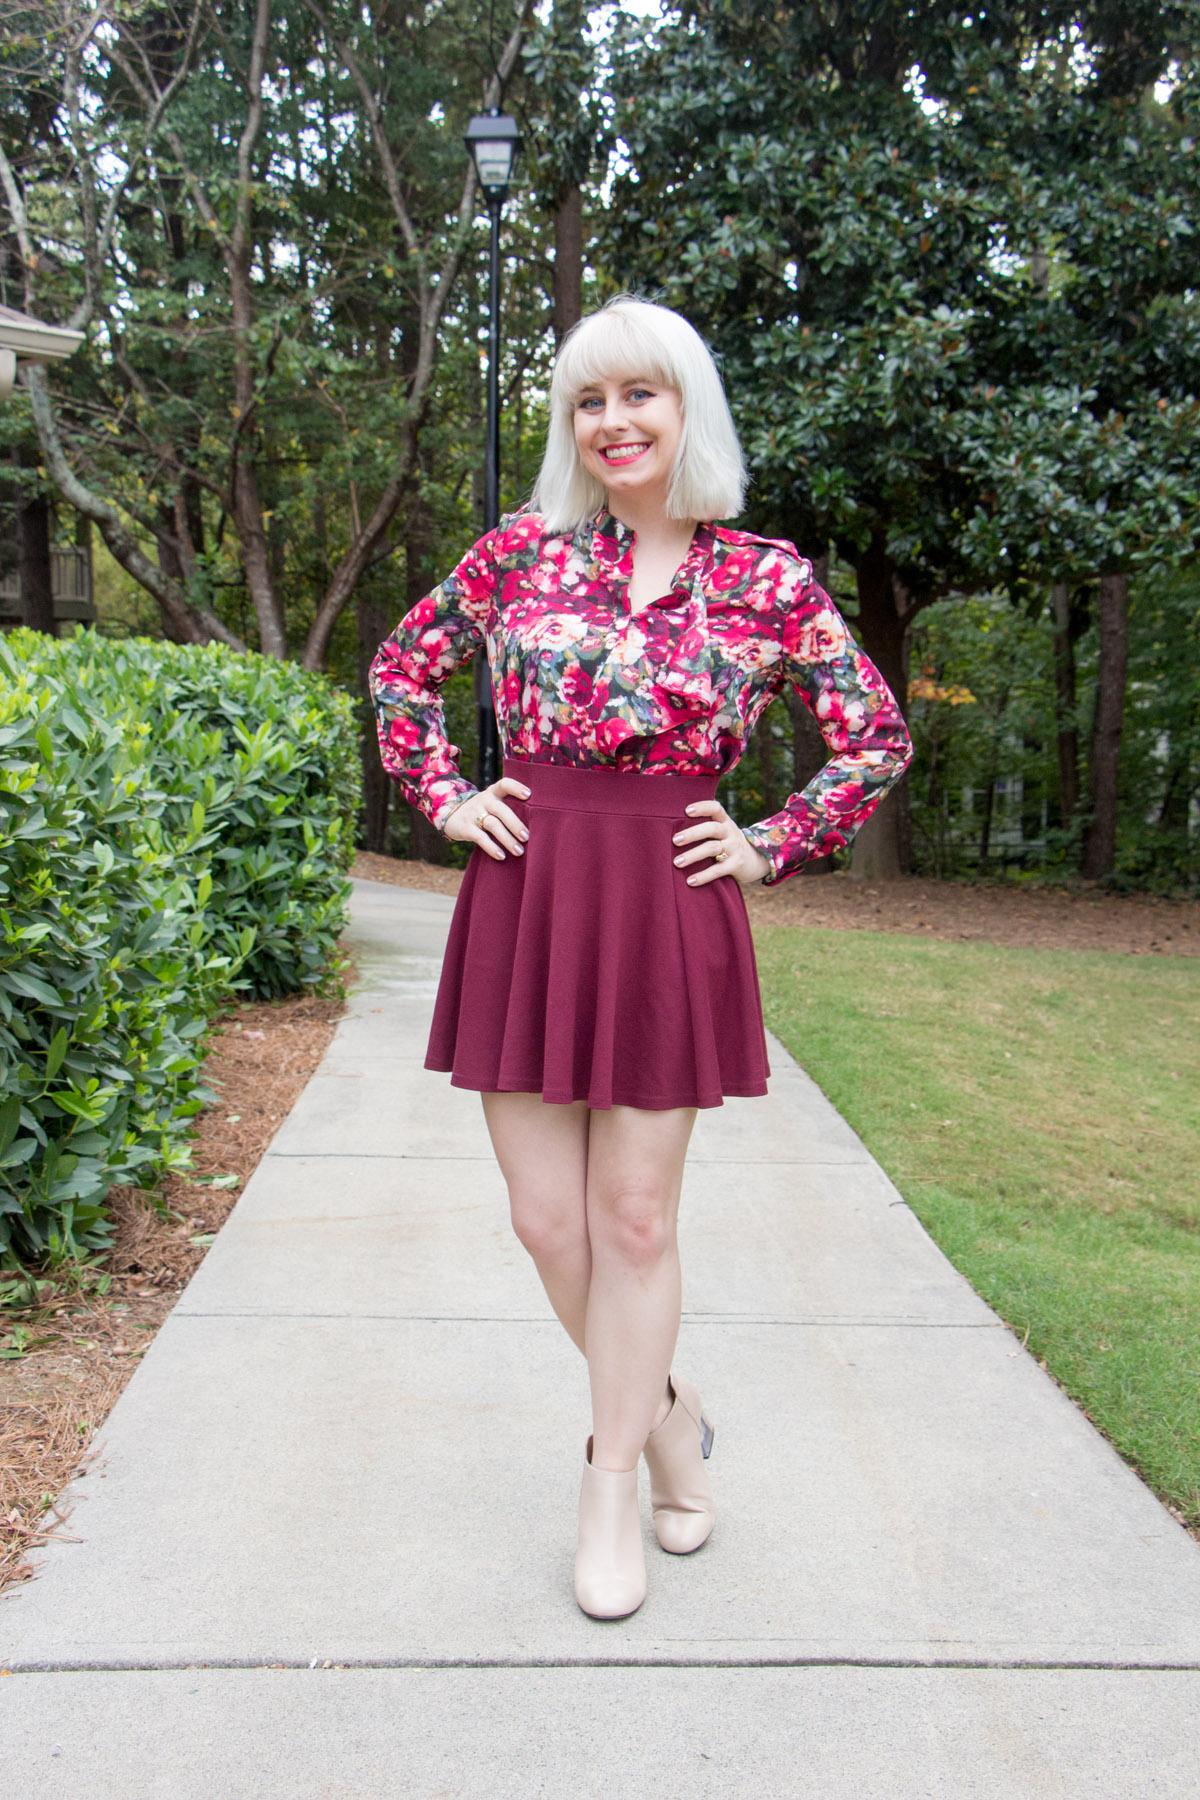 Floral Print Ruffled Blouse, Oxblood Skater Skirt, Nude Steve Madden Ankle Boots